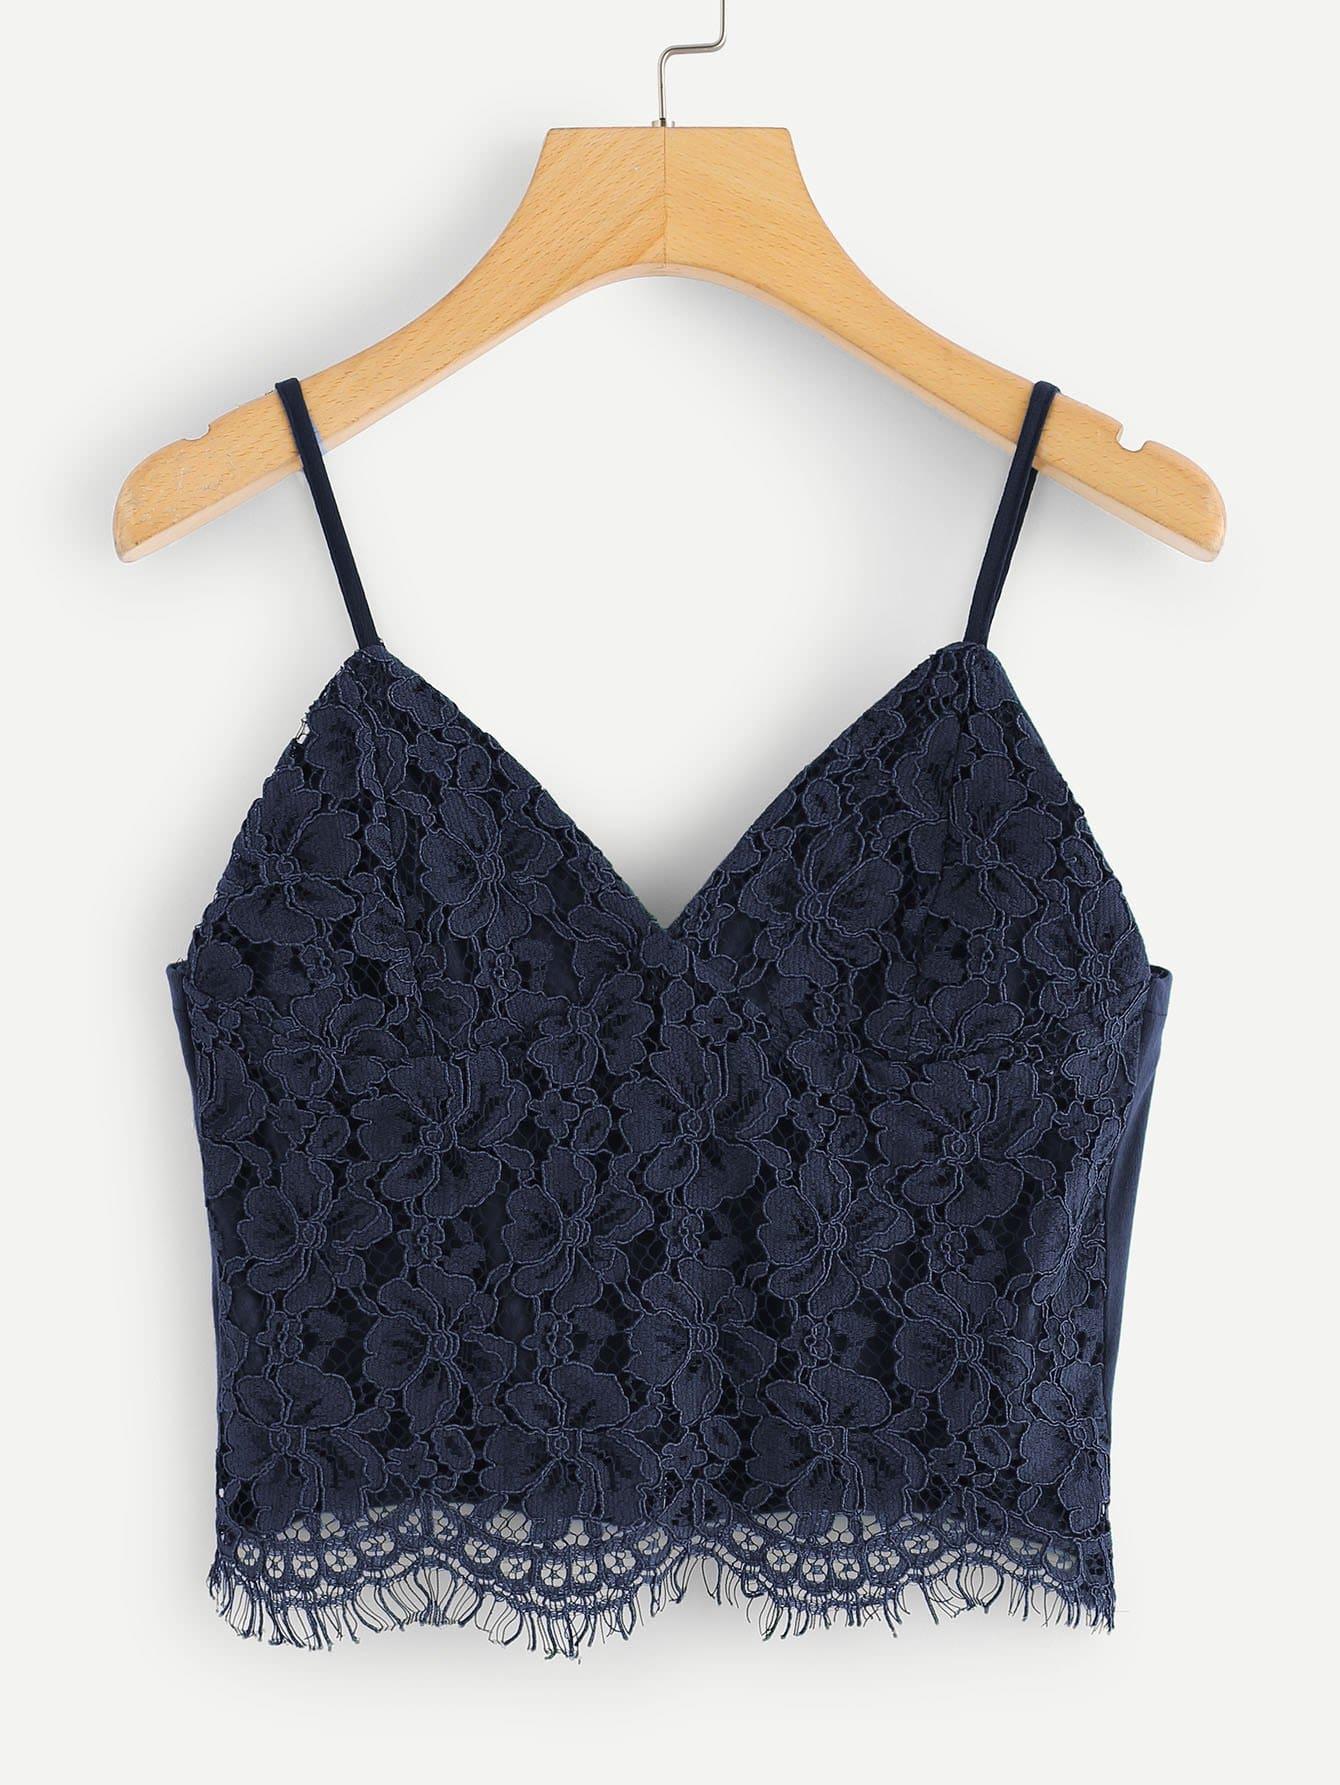 Eyelash Lace Overlay Zipper Back Crop Cami Top black choker sleeveless crop top